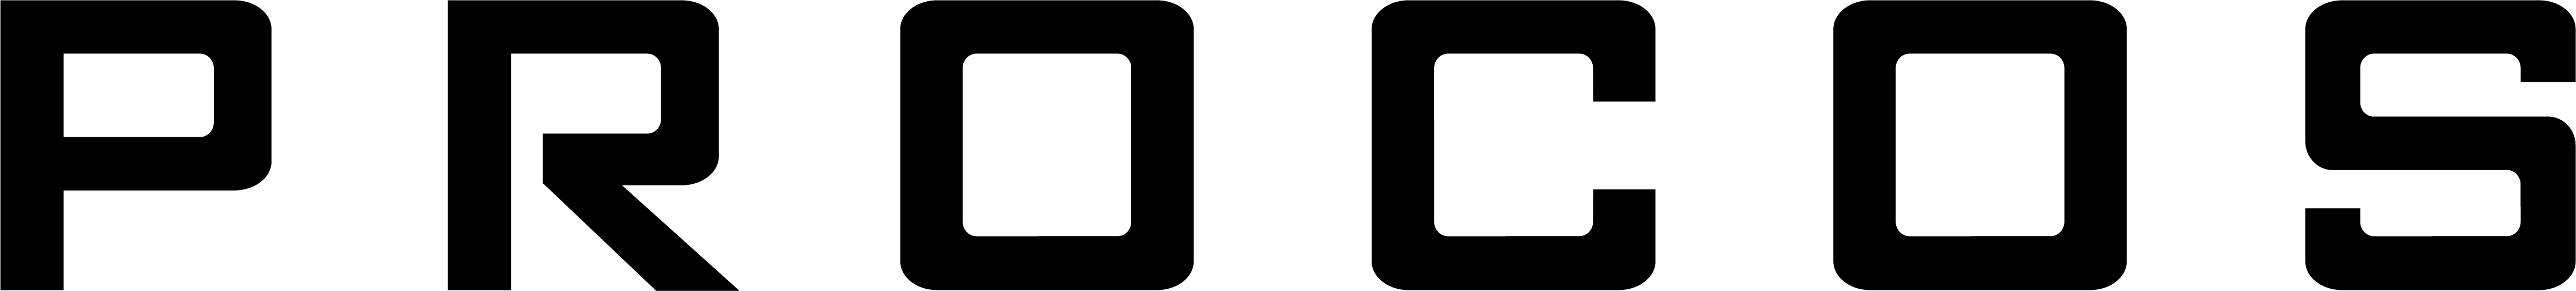 procos.net